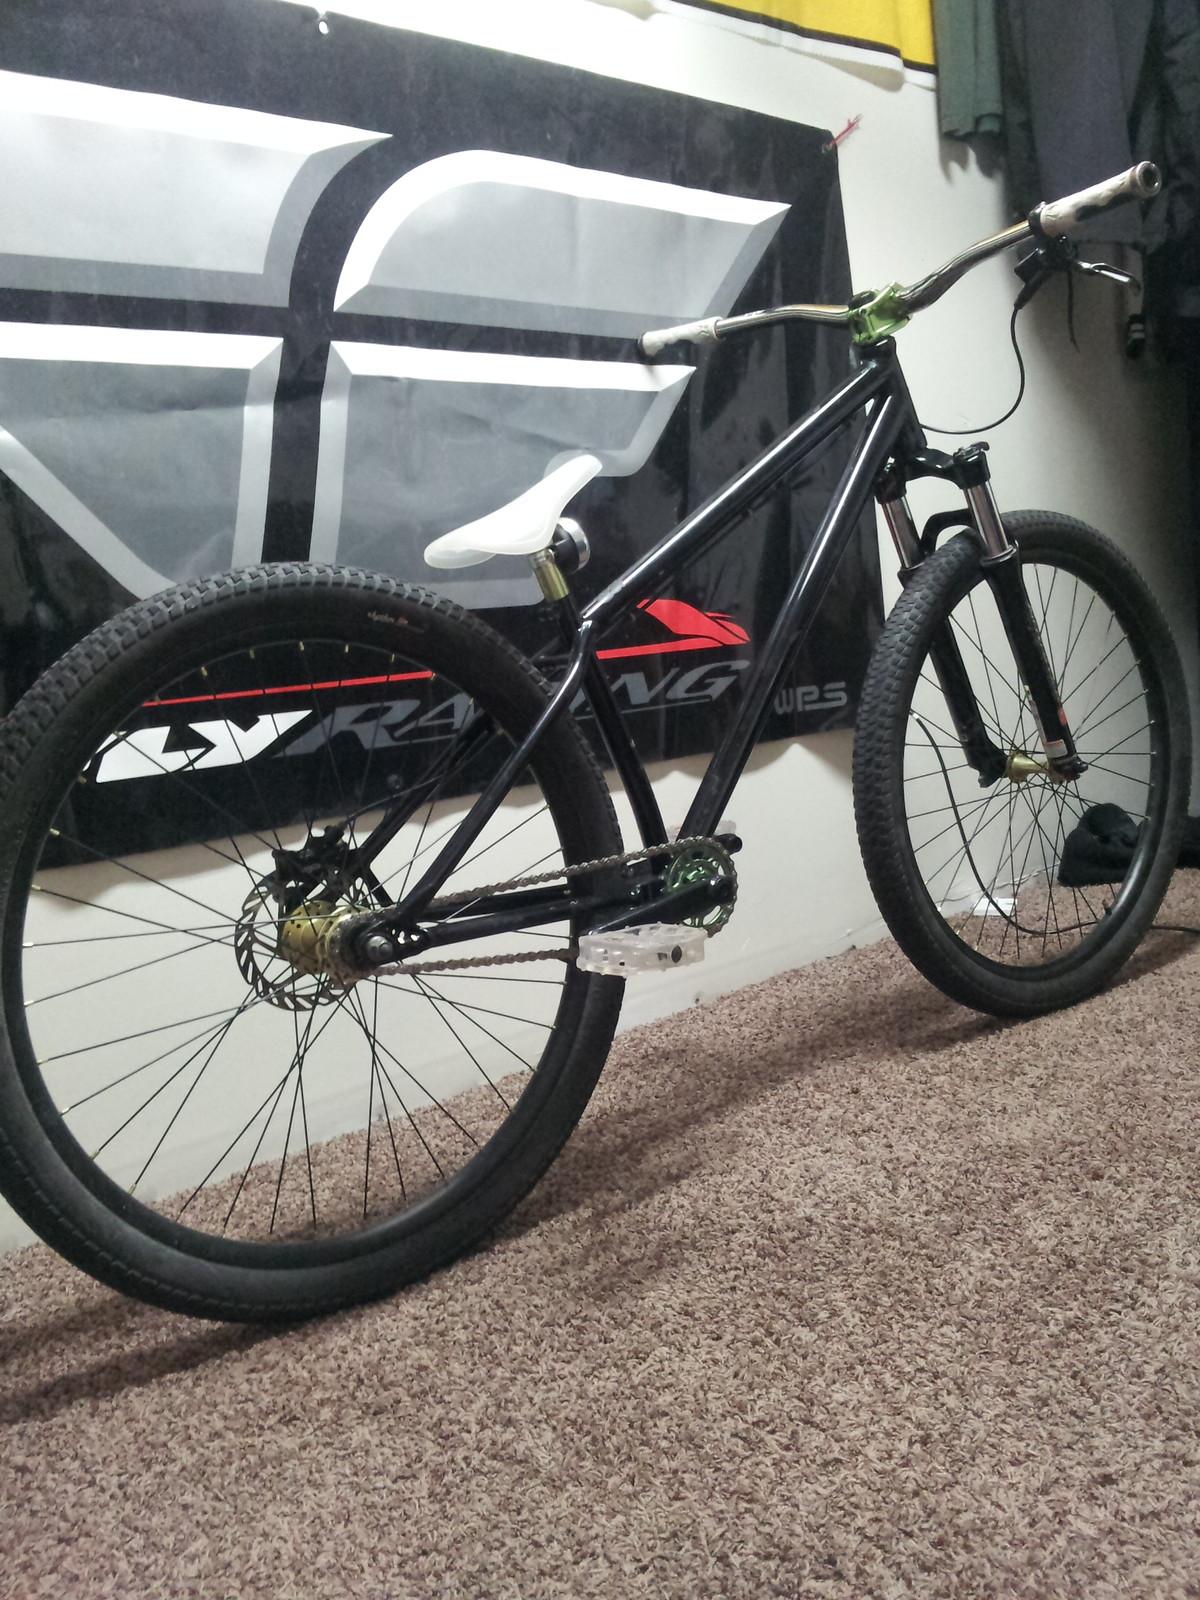 Dills Bike Check